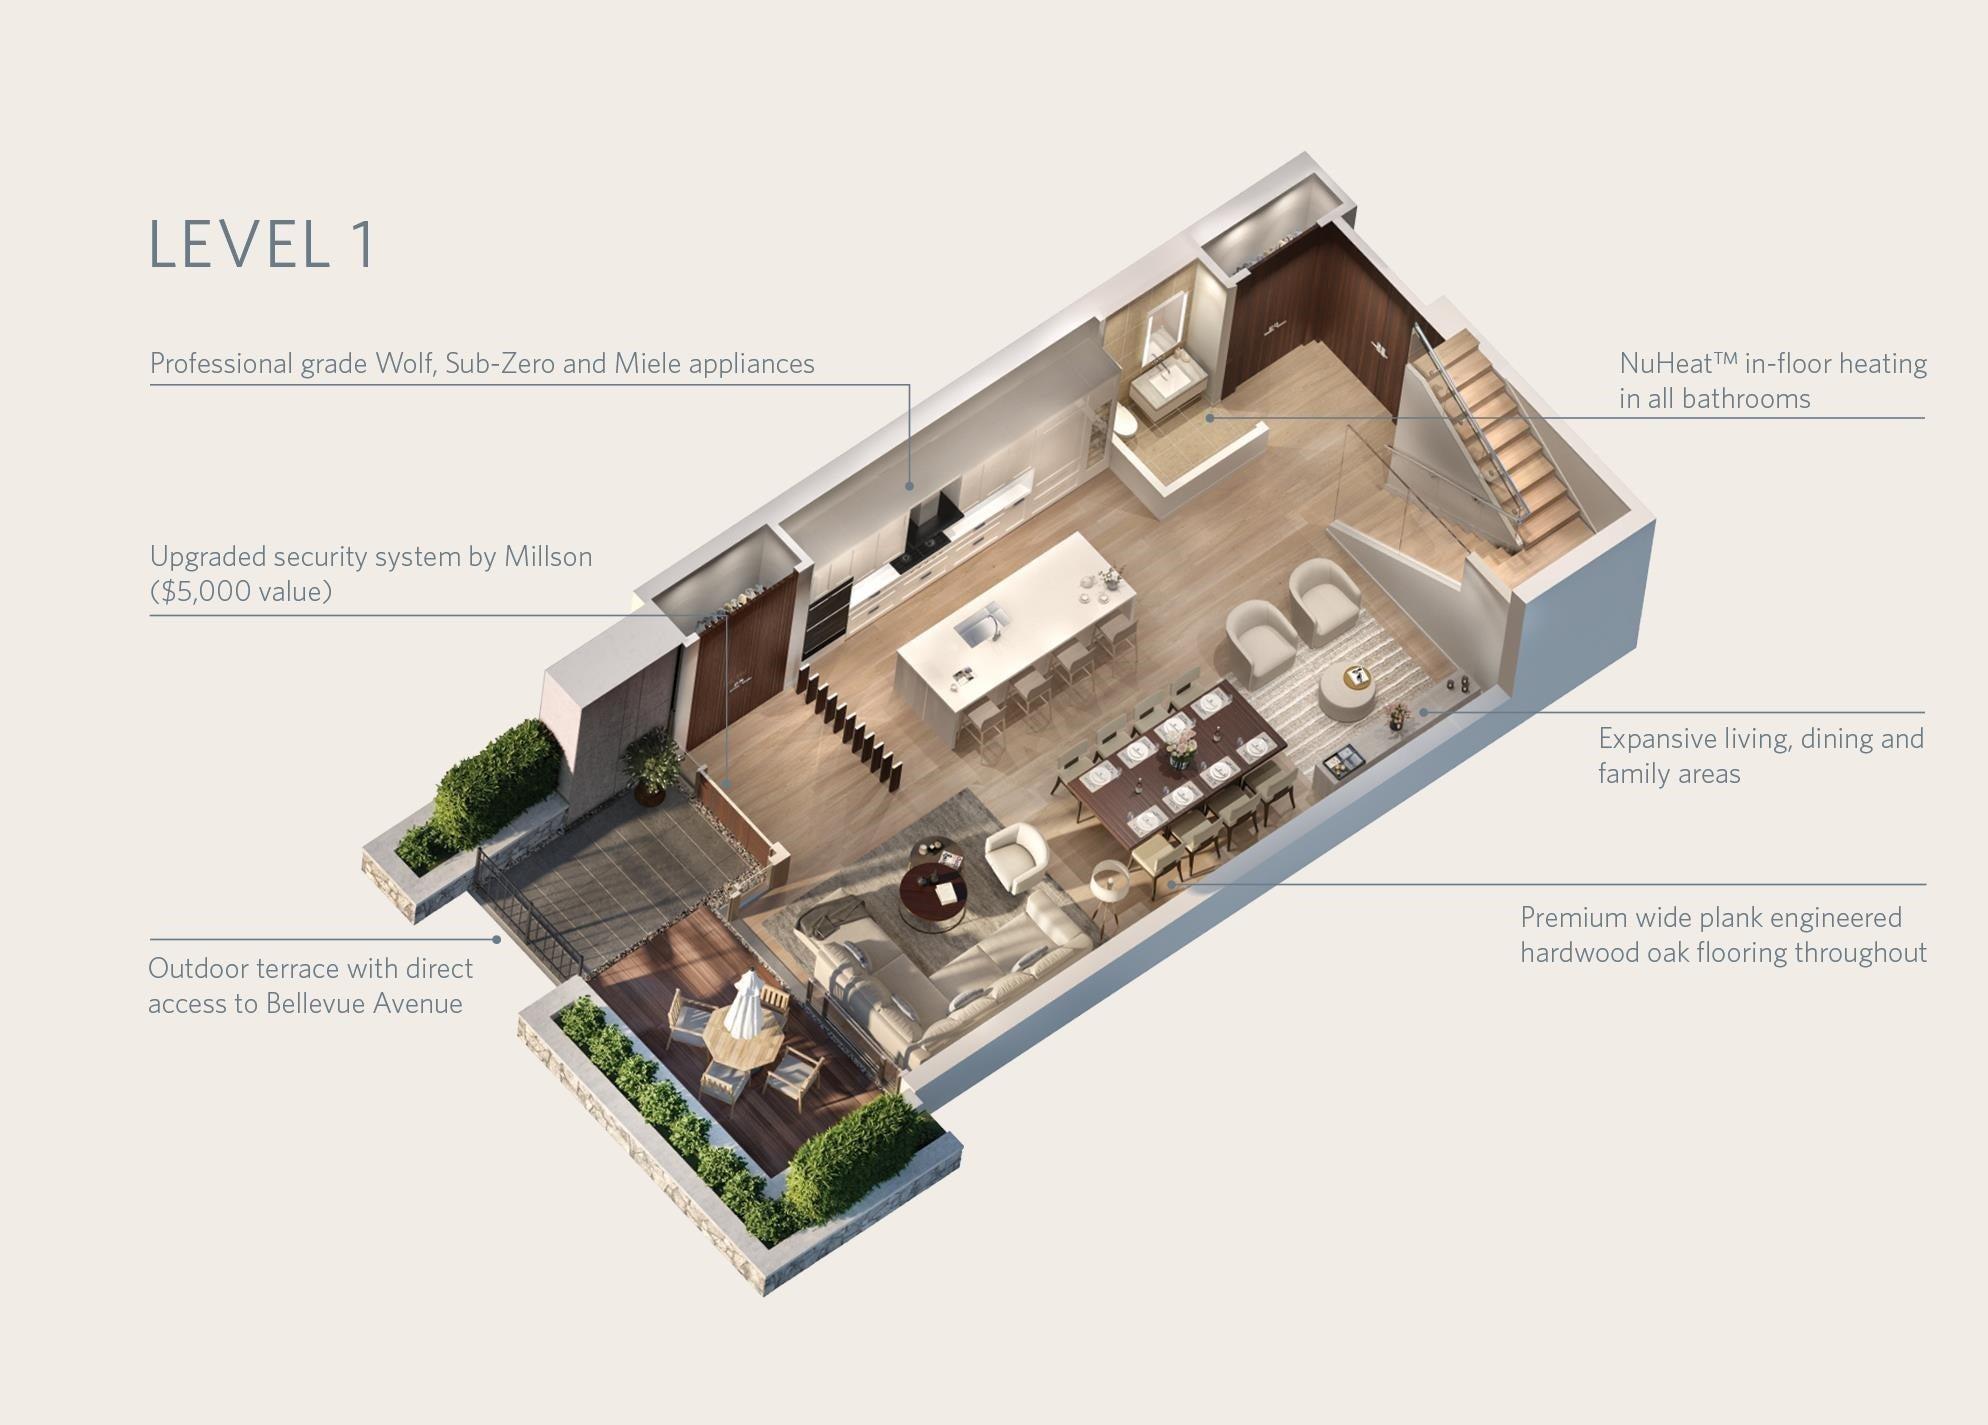 TH102 1327 BELLEVUE AVENUE - Ambleside Townhouse for sale, 2 Bedrooms (R2596338) - #37